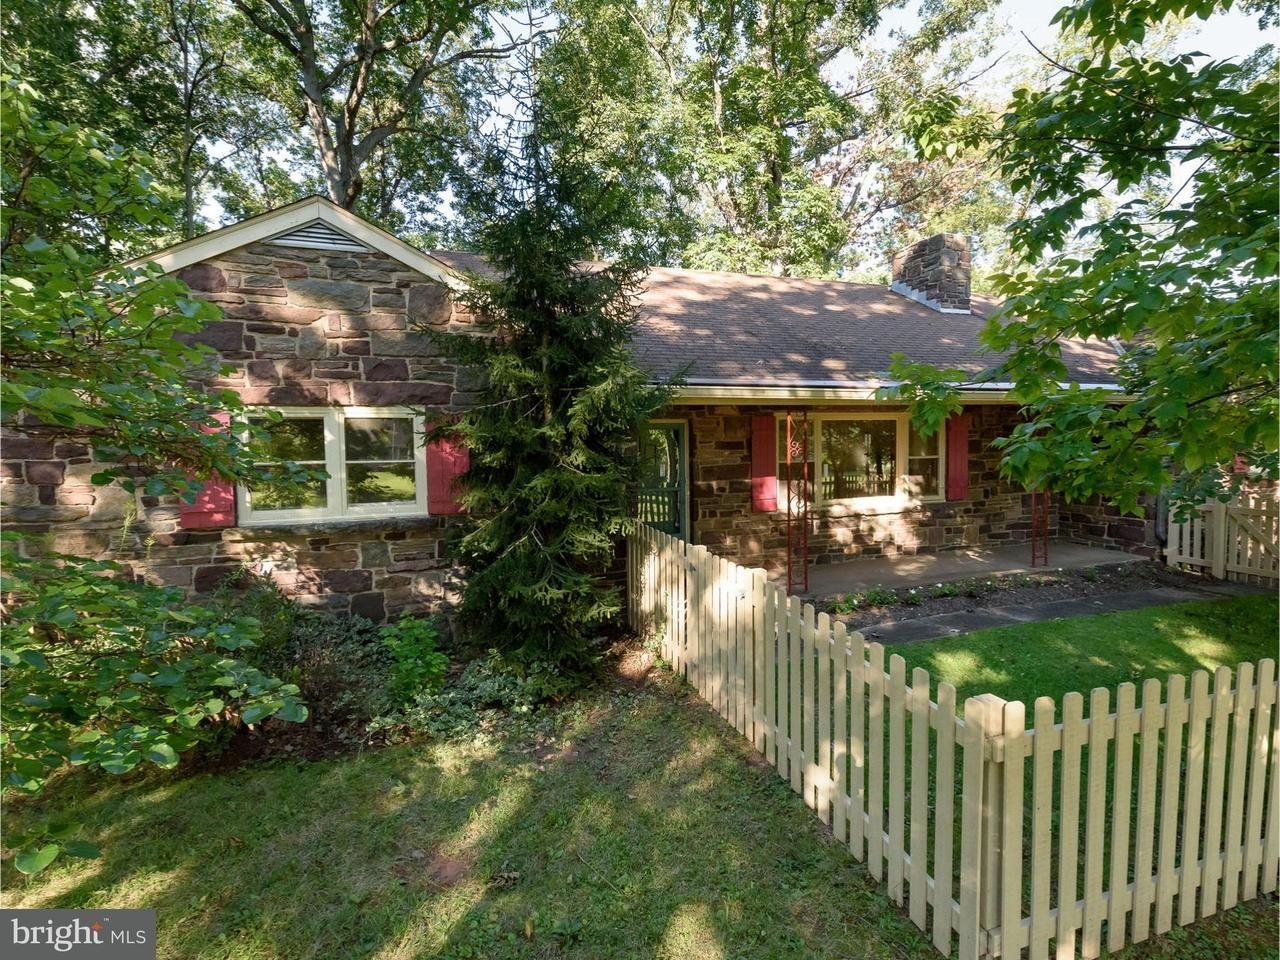 351 Oak Dr, Harleysville, PA